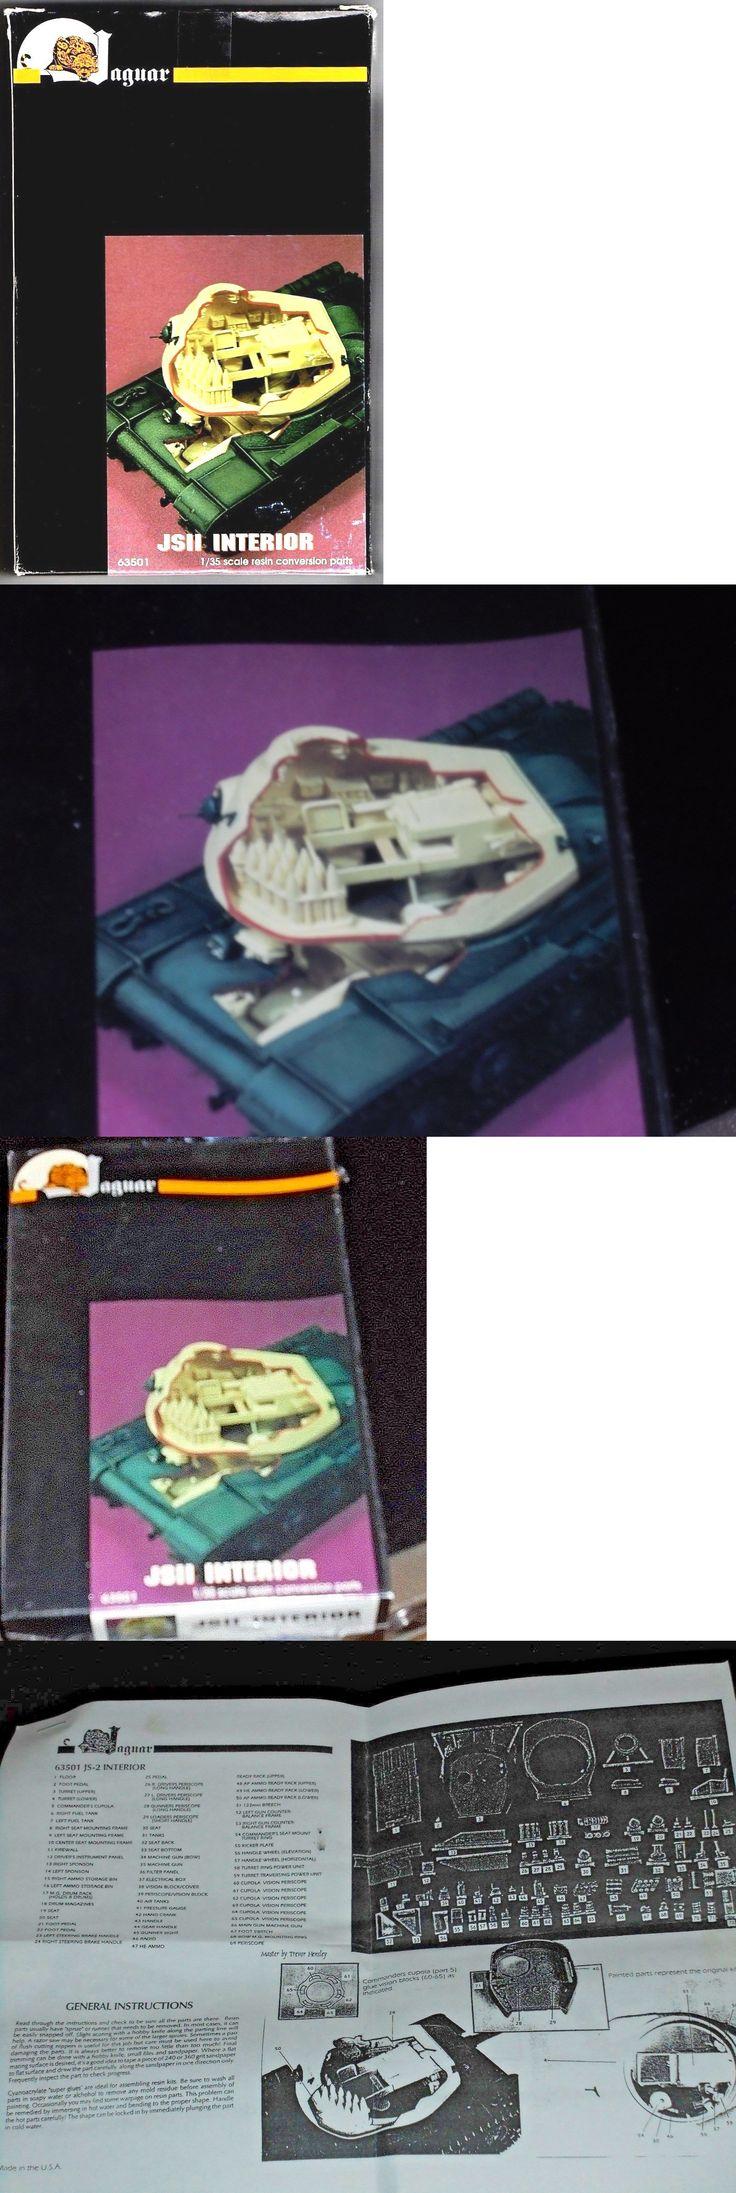 Pre-1970 734: Jaguar Models 63501 - Jsii Interior Conversion Set 1 35 Resin Kit -> BUY IT NOW ONLY: $43.95 on eBay!